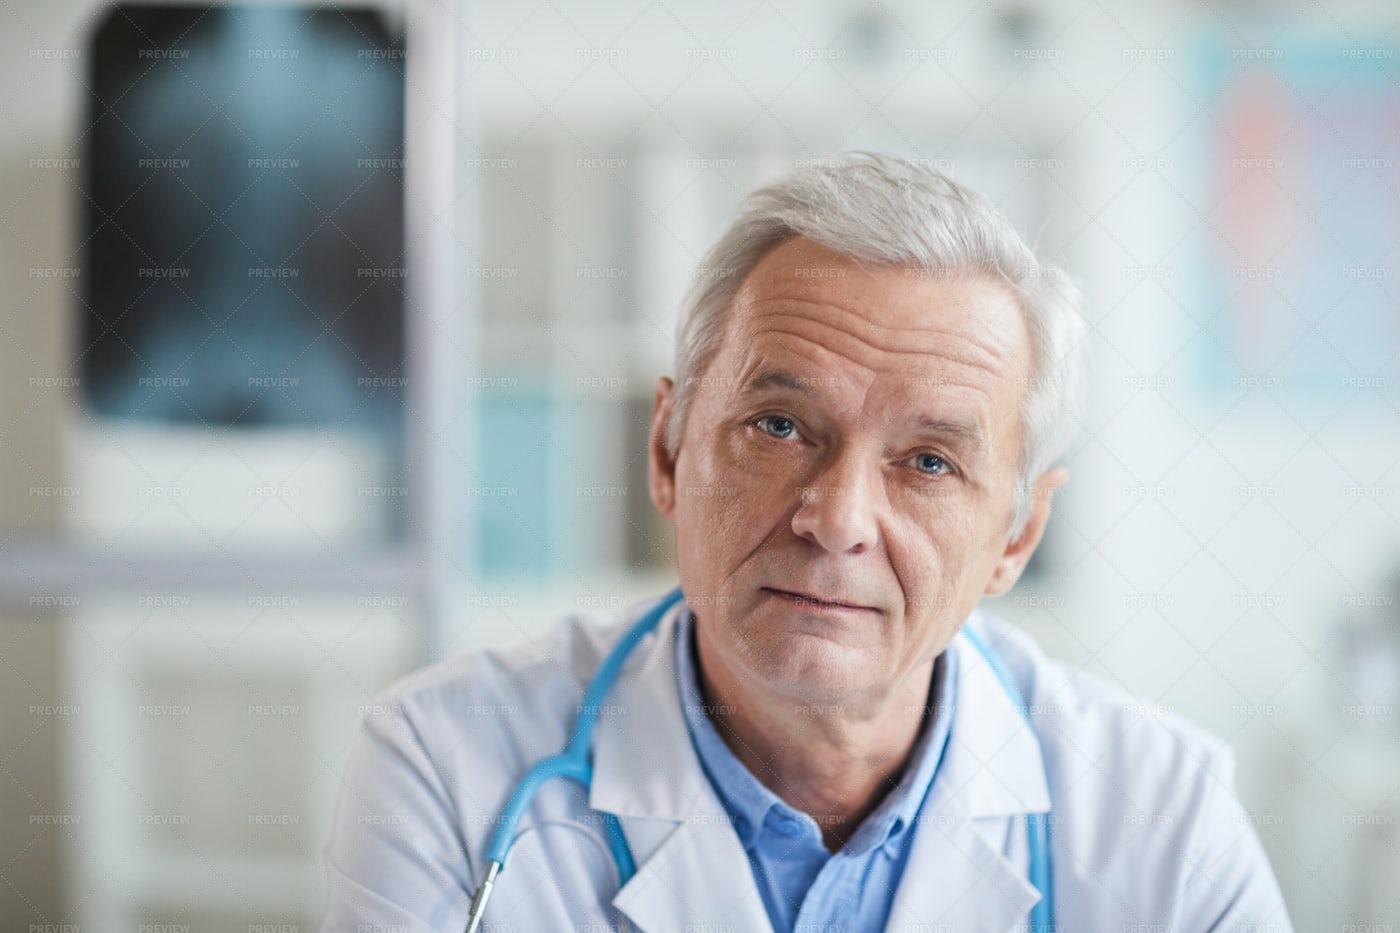 Senior Medical Professional Portrait: Stock Photos